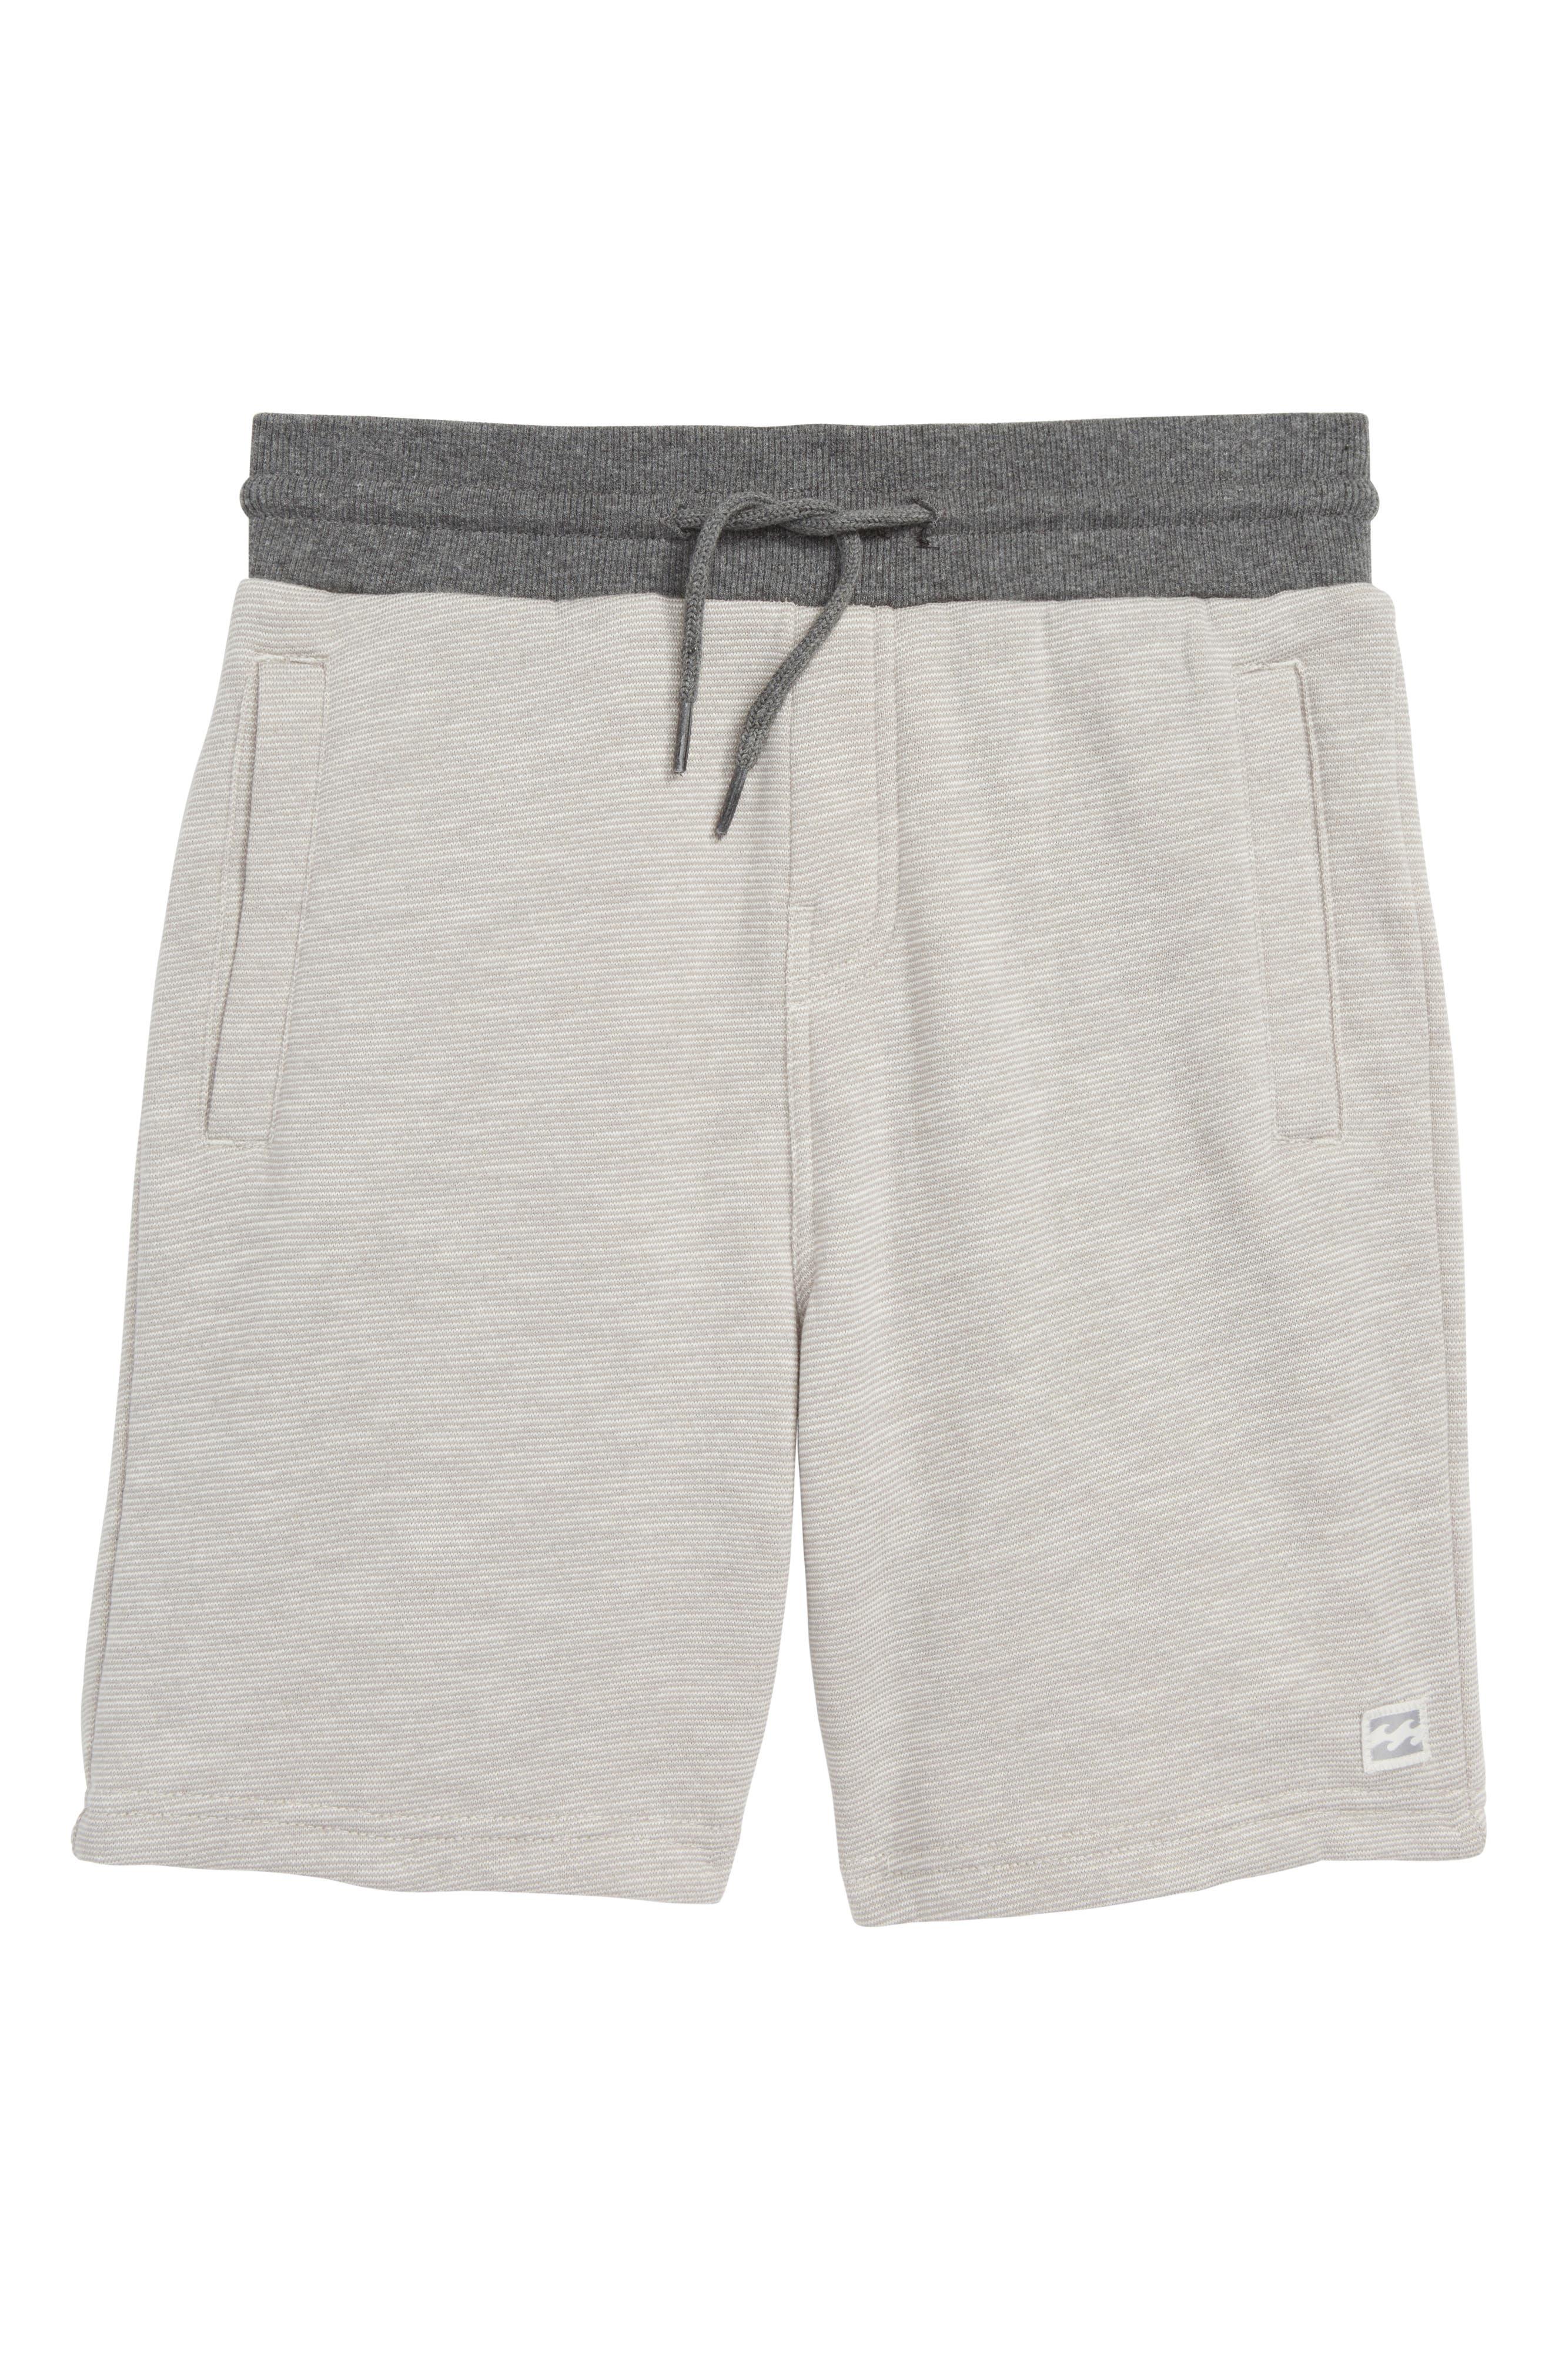 BILLABONG Balance Shorts, Main, color, OATMEAL